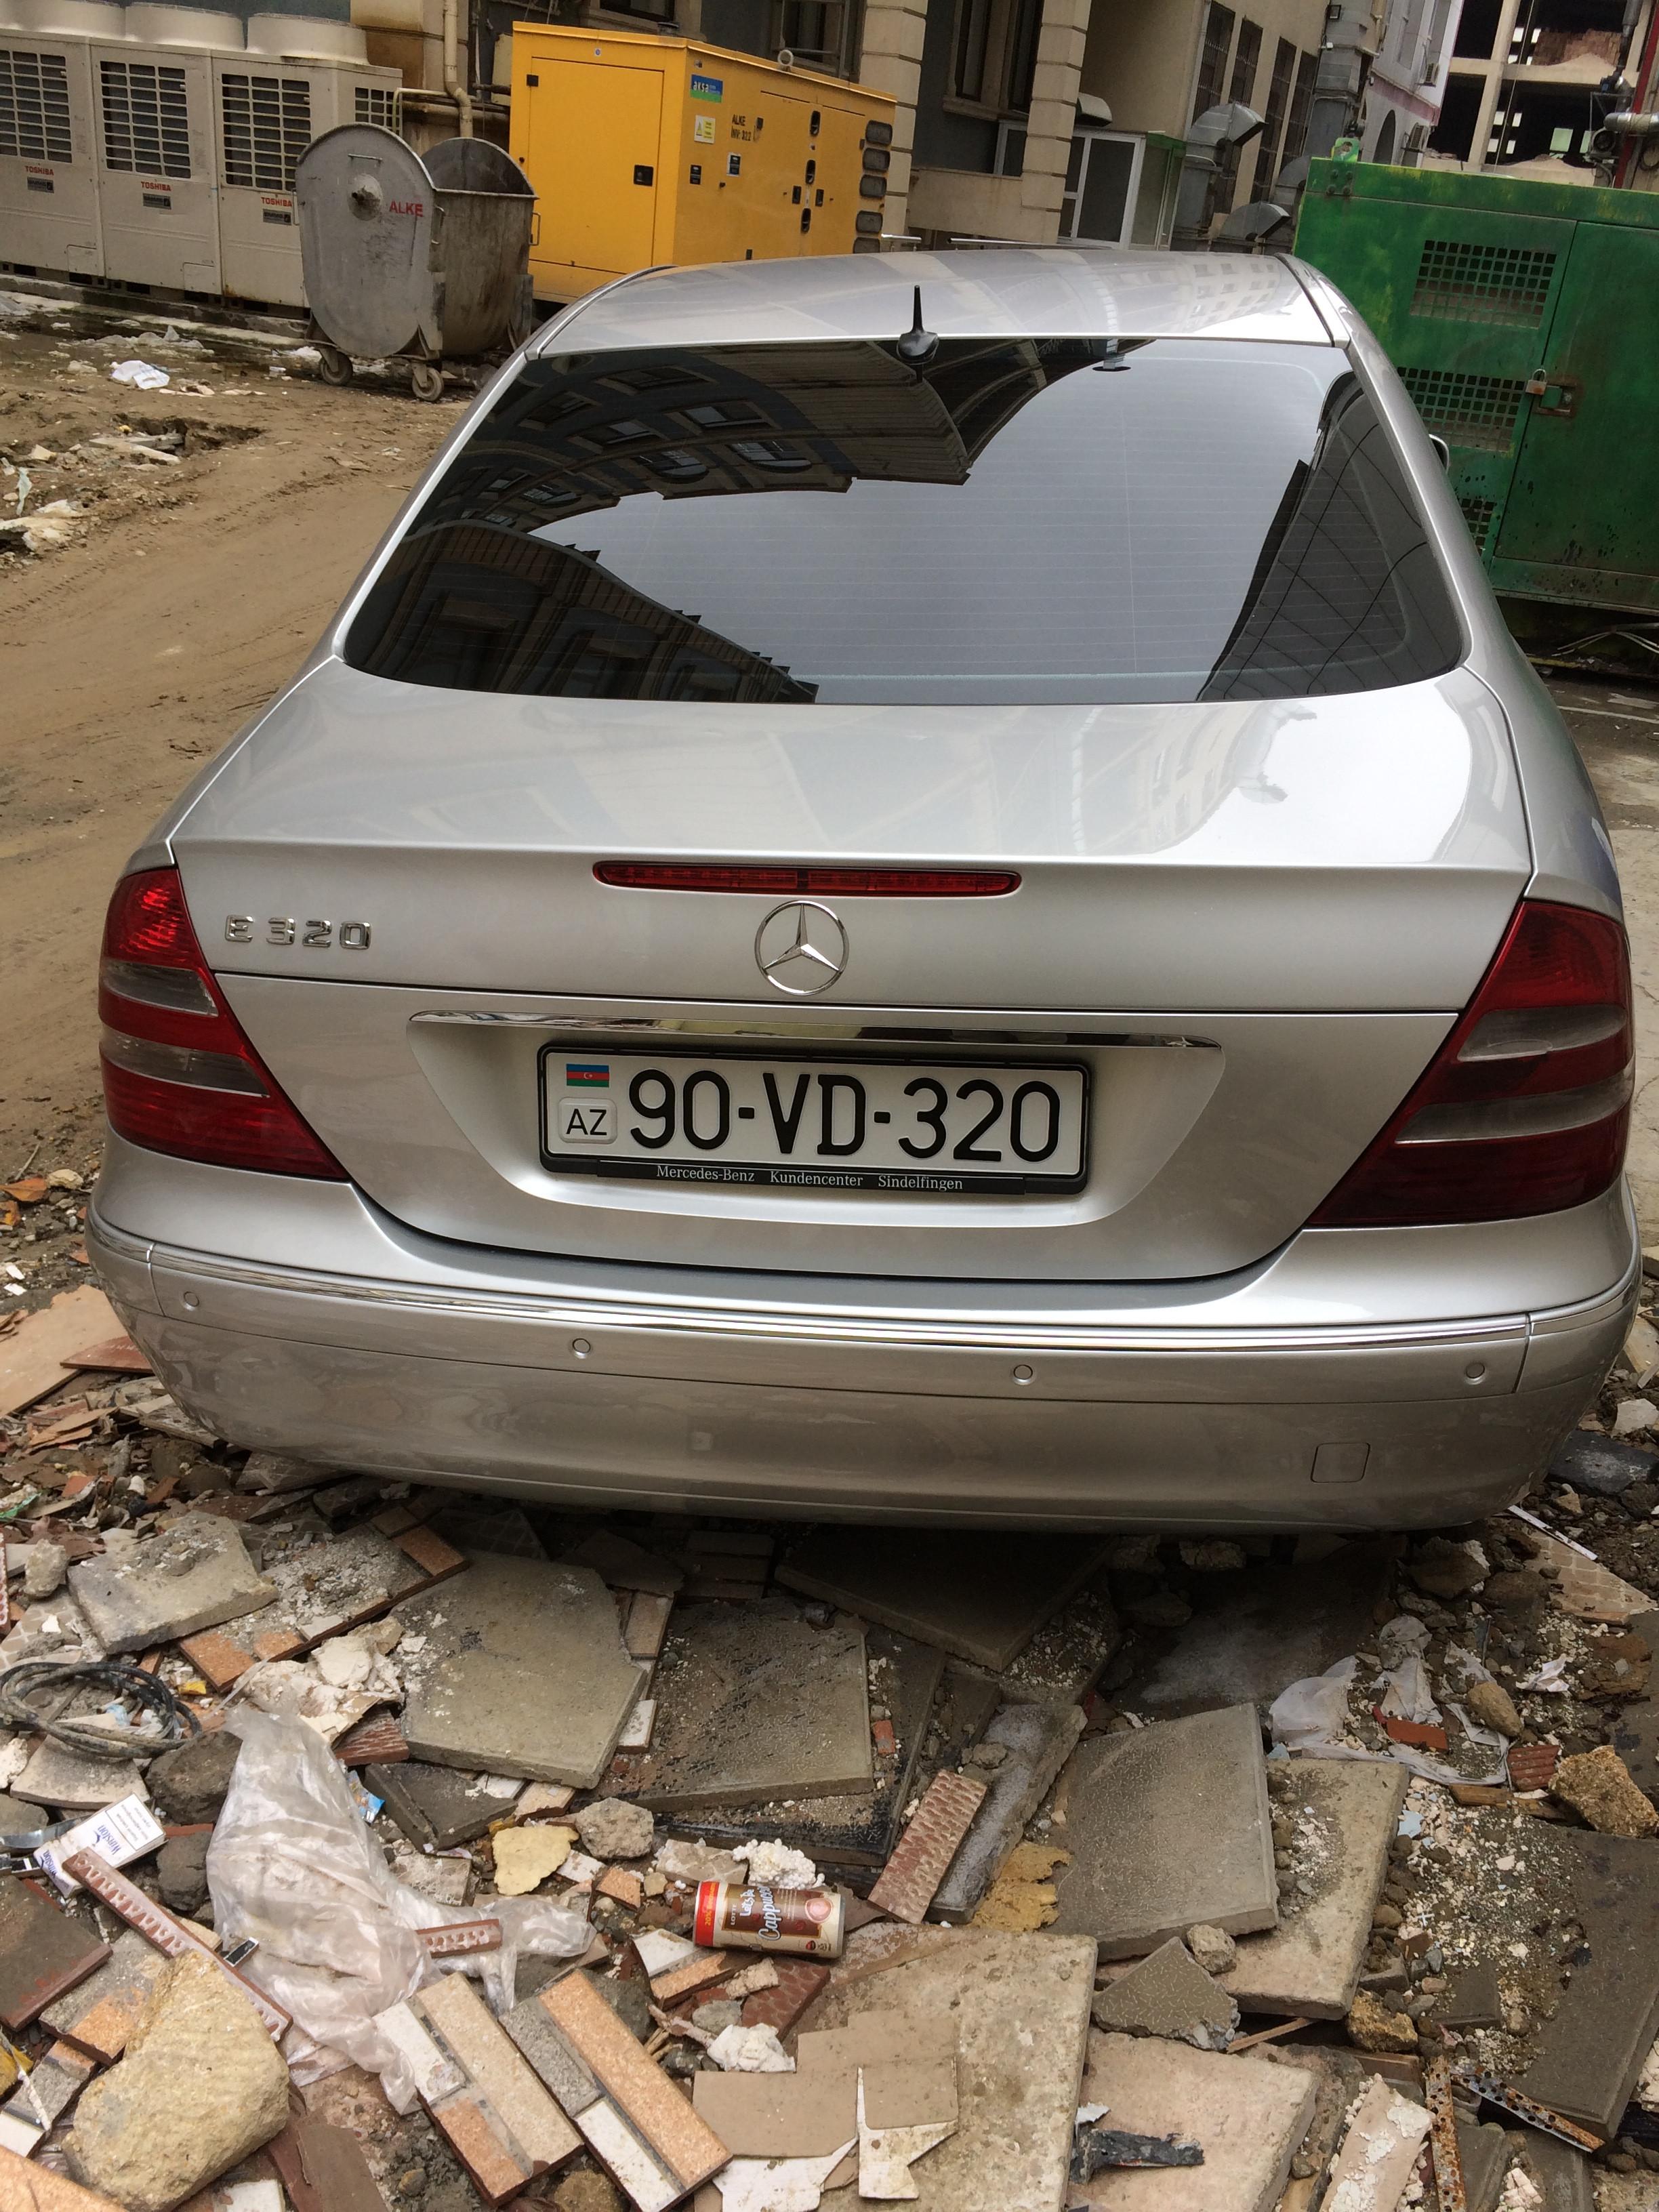 Mercedes-Benz E 320 3.2(lt) 2003 Подержанный  $16000